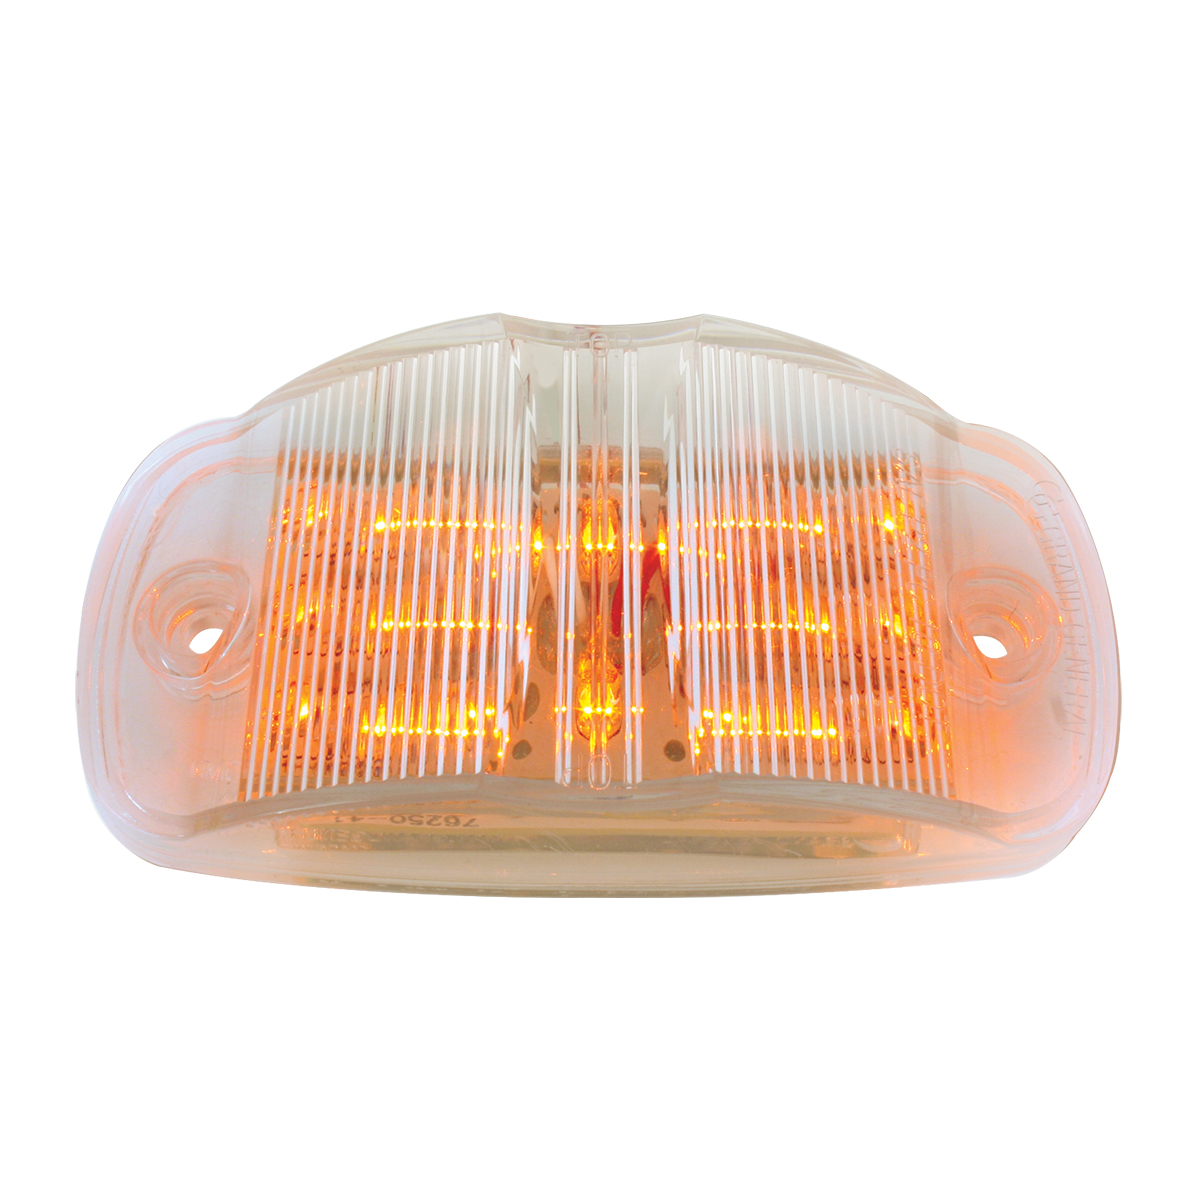 Rectangular Camel Back Wide Angle LED Marker Light in Amber/Clear